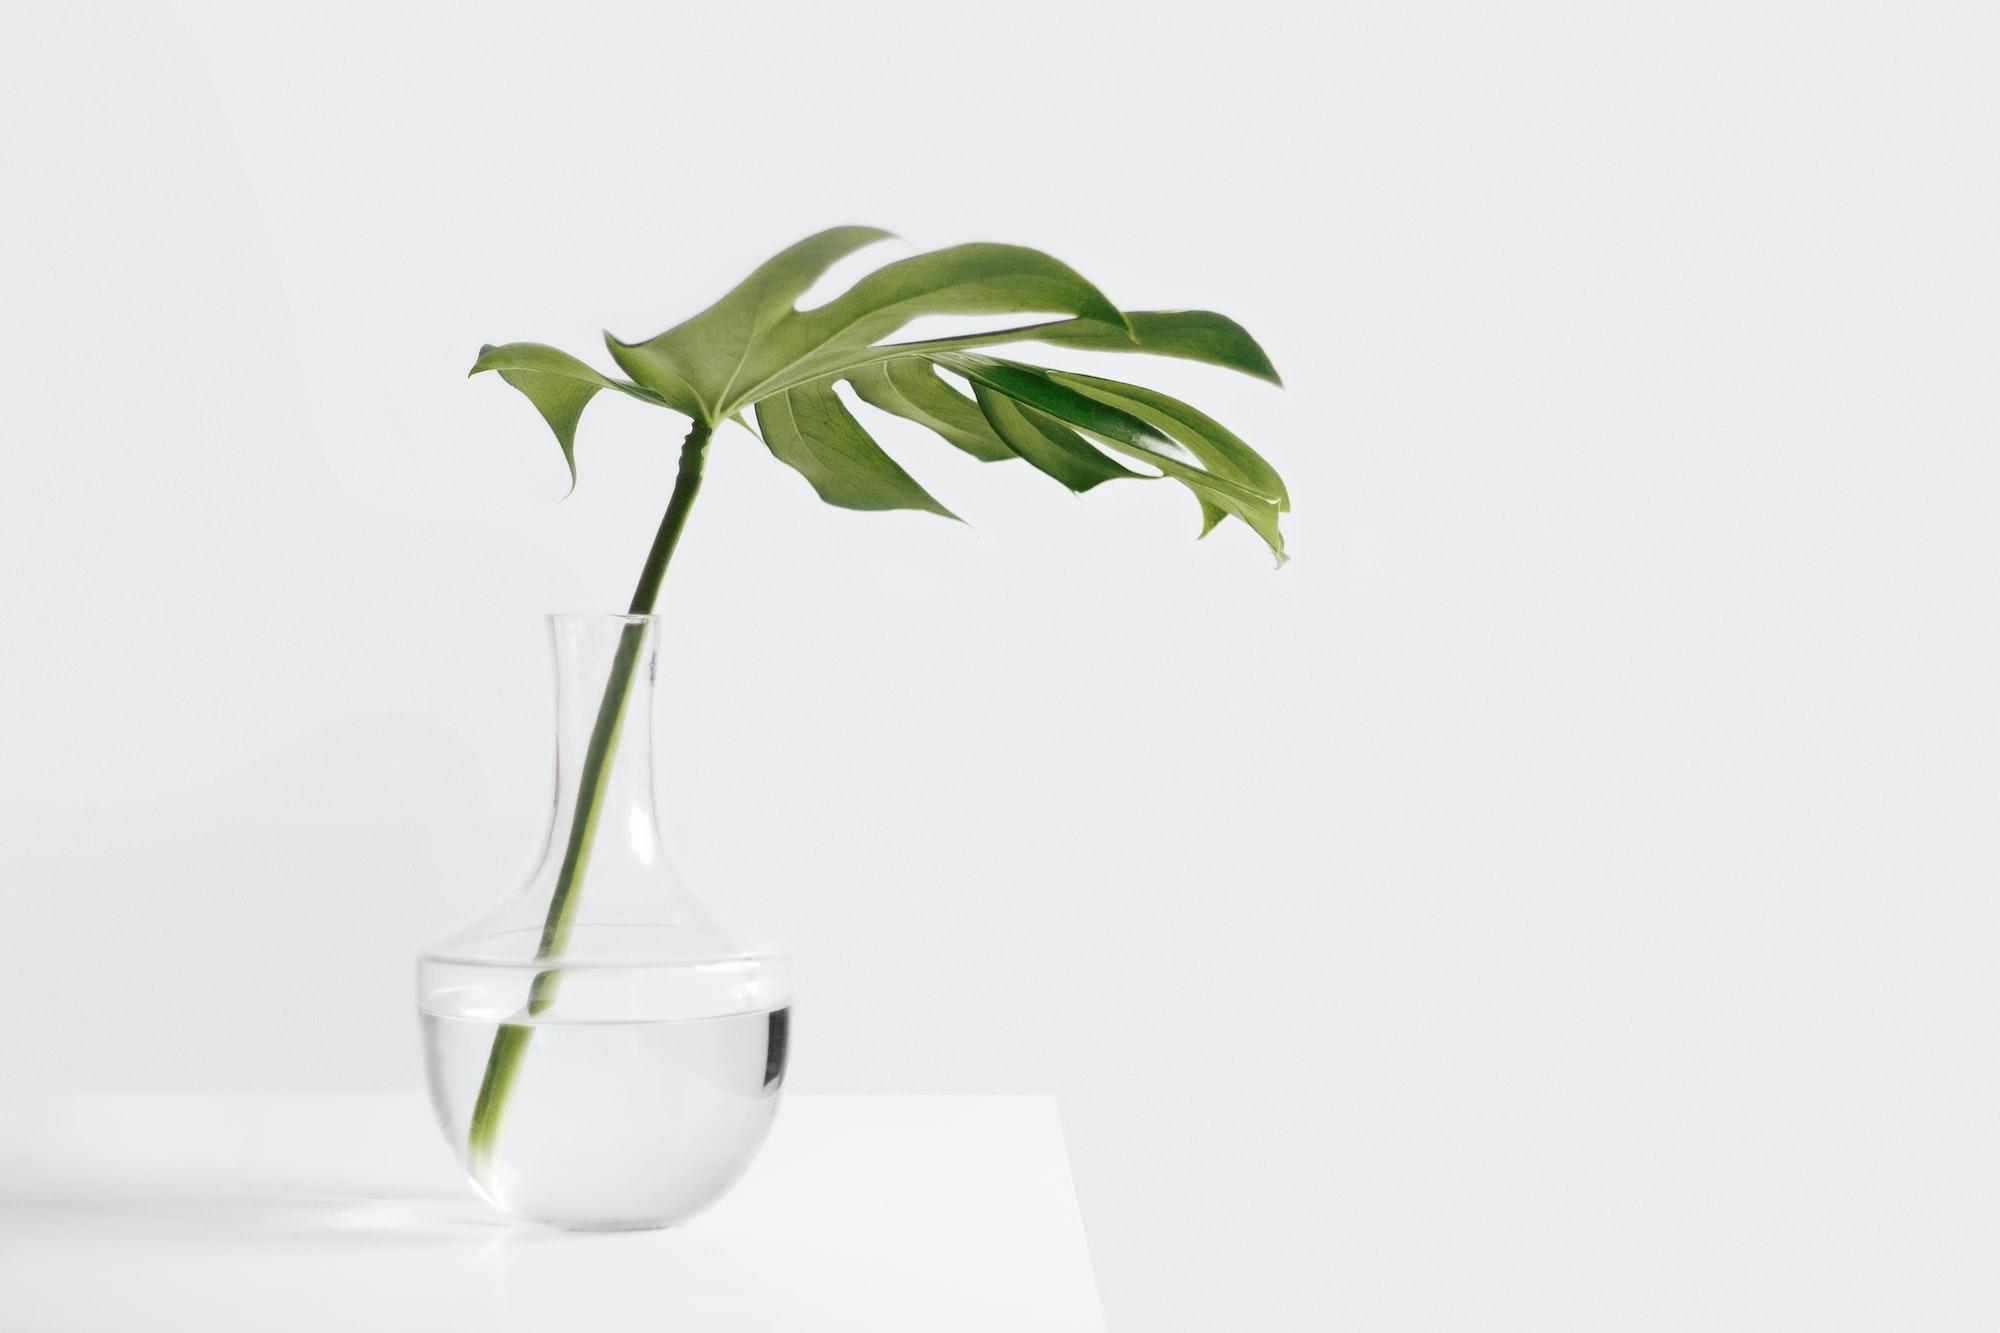 Ganti Suasana Kamar Dengan 7 Ide Dekorasi Kamar Aesthetic Berikut